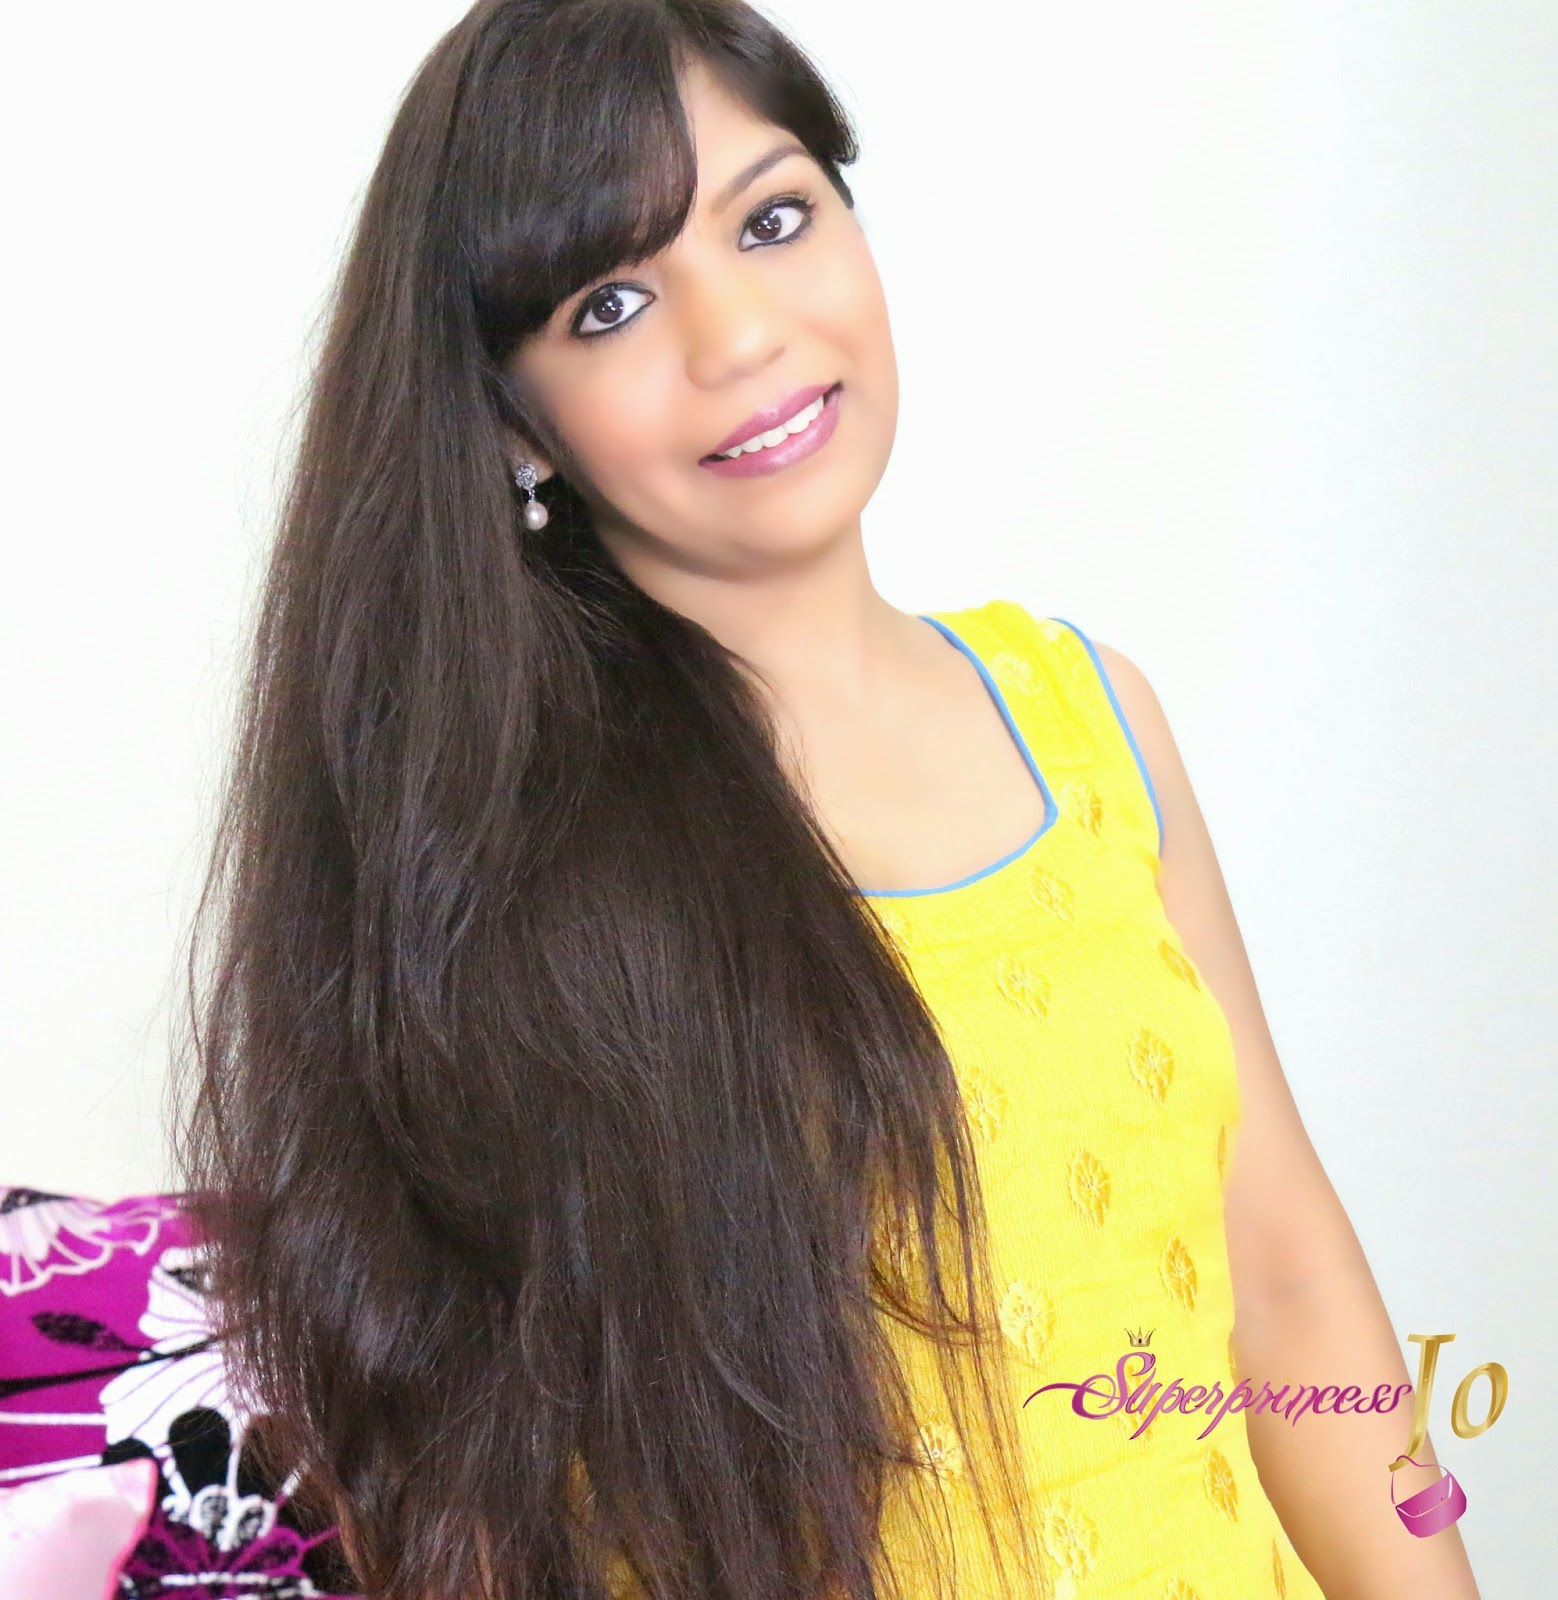 Superprincessjo How To Apply Henna Dye To Natural Long Hair Indian